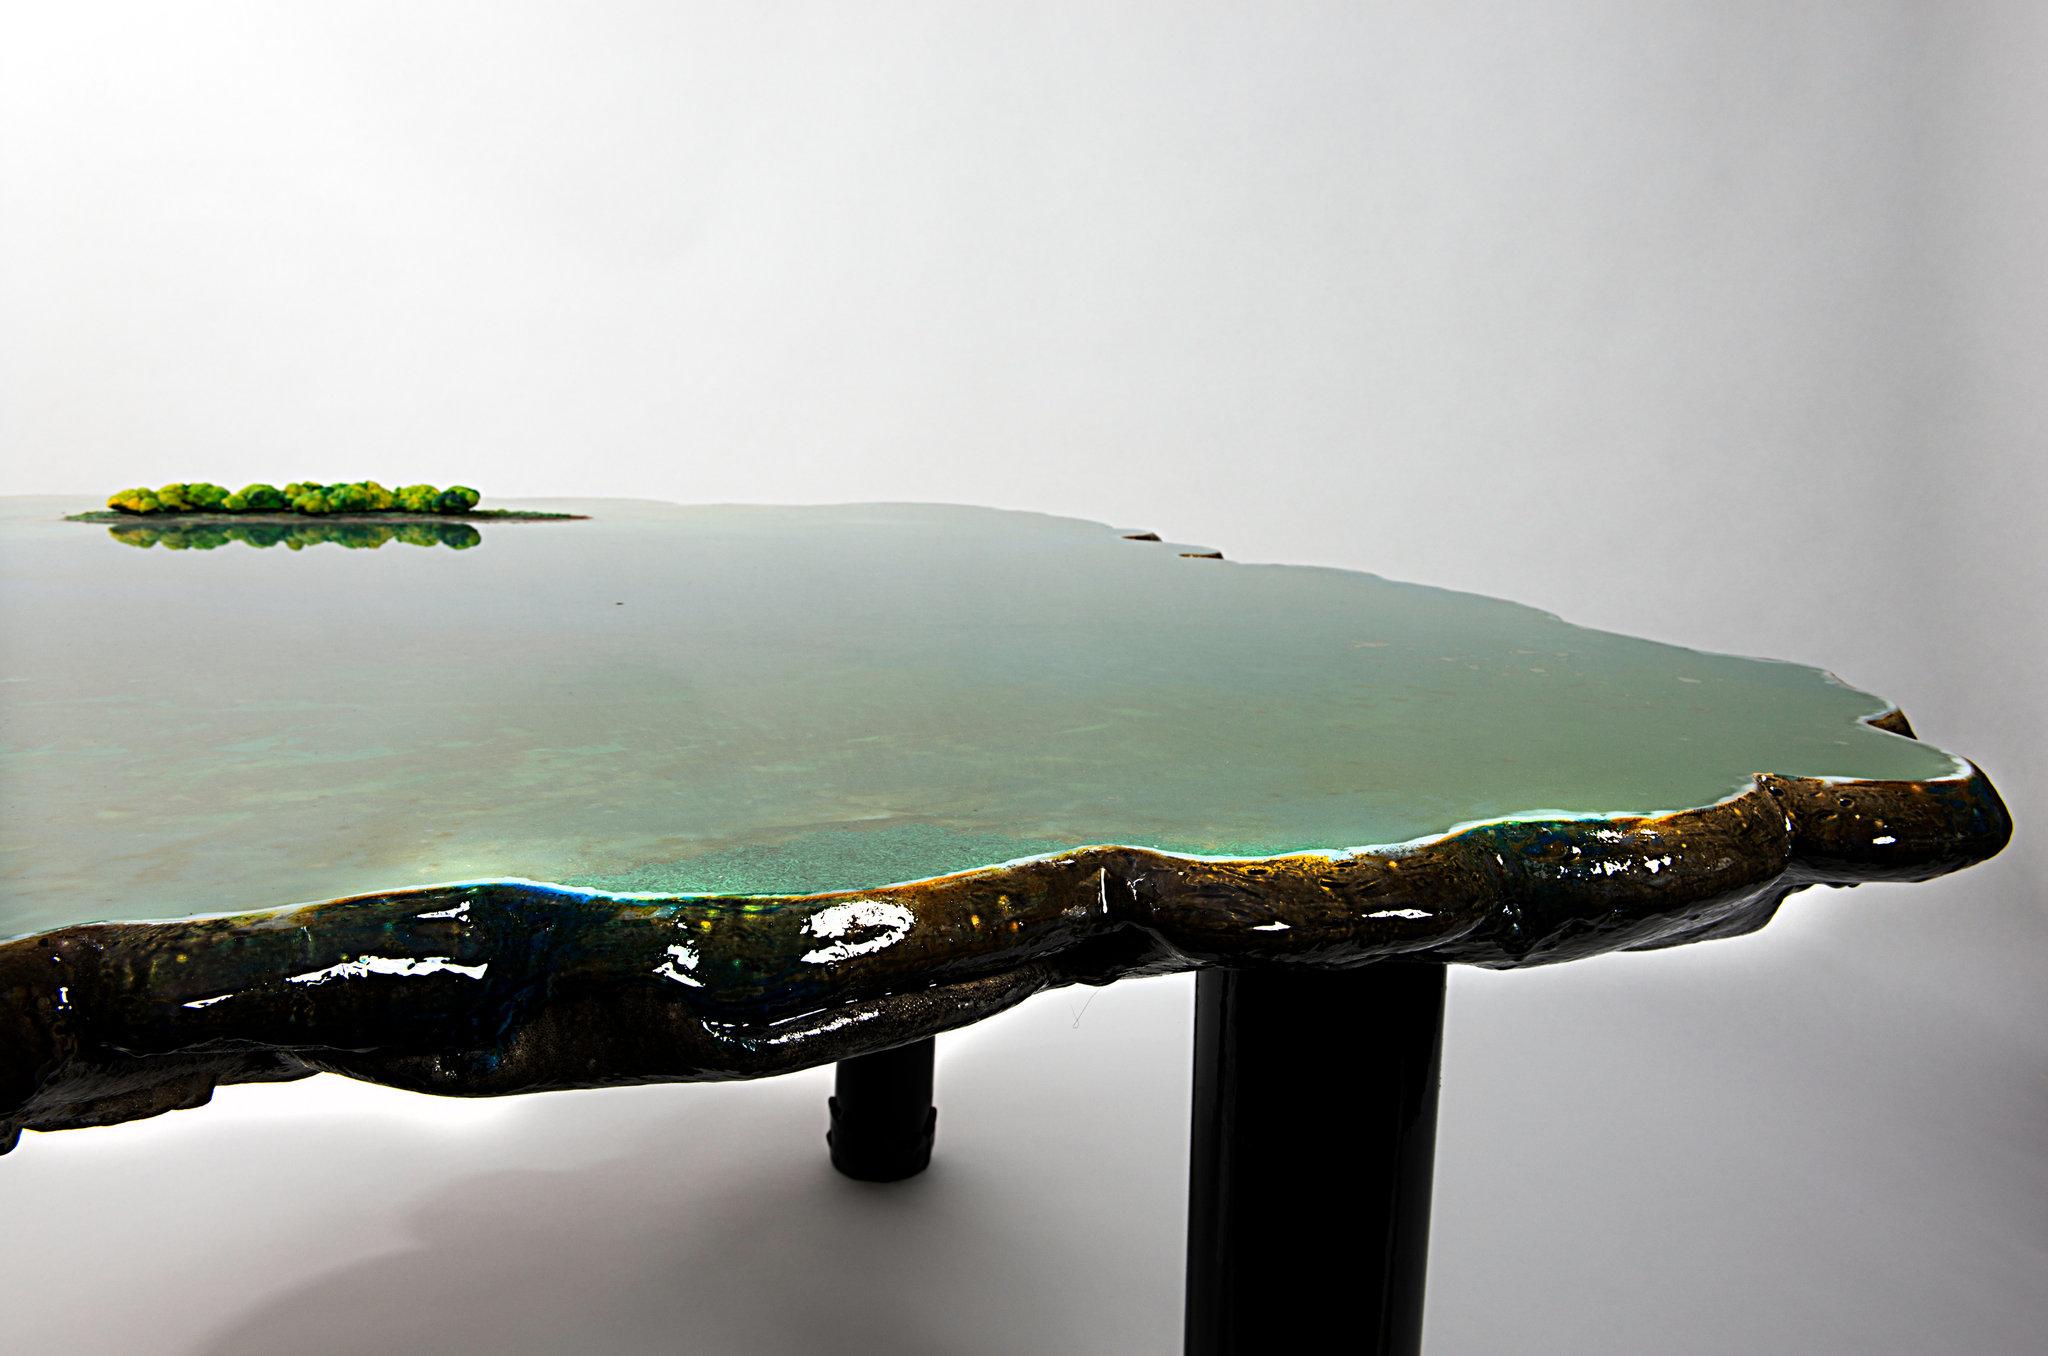 9 gaetano pesce pond table david gill galleries london italian furniture interior design home decor wloskie meble luksusowe projektowanie wnetrz sebastian piras nytimes